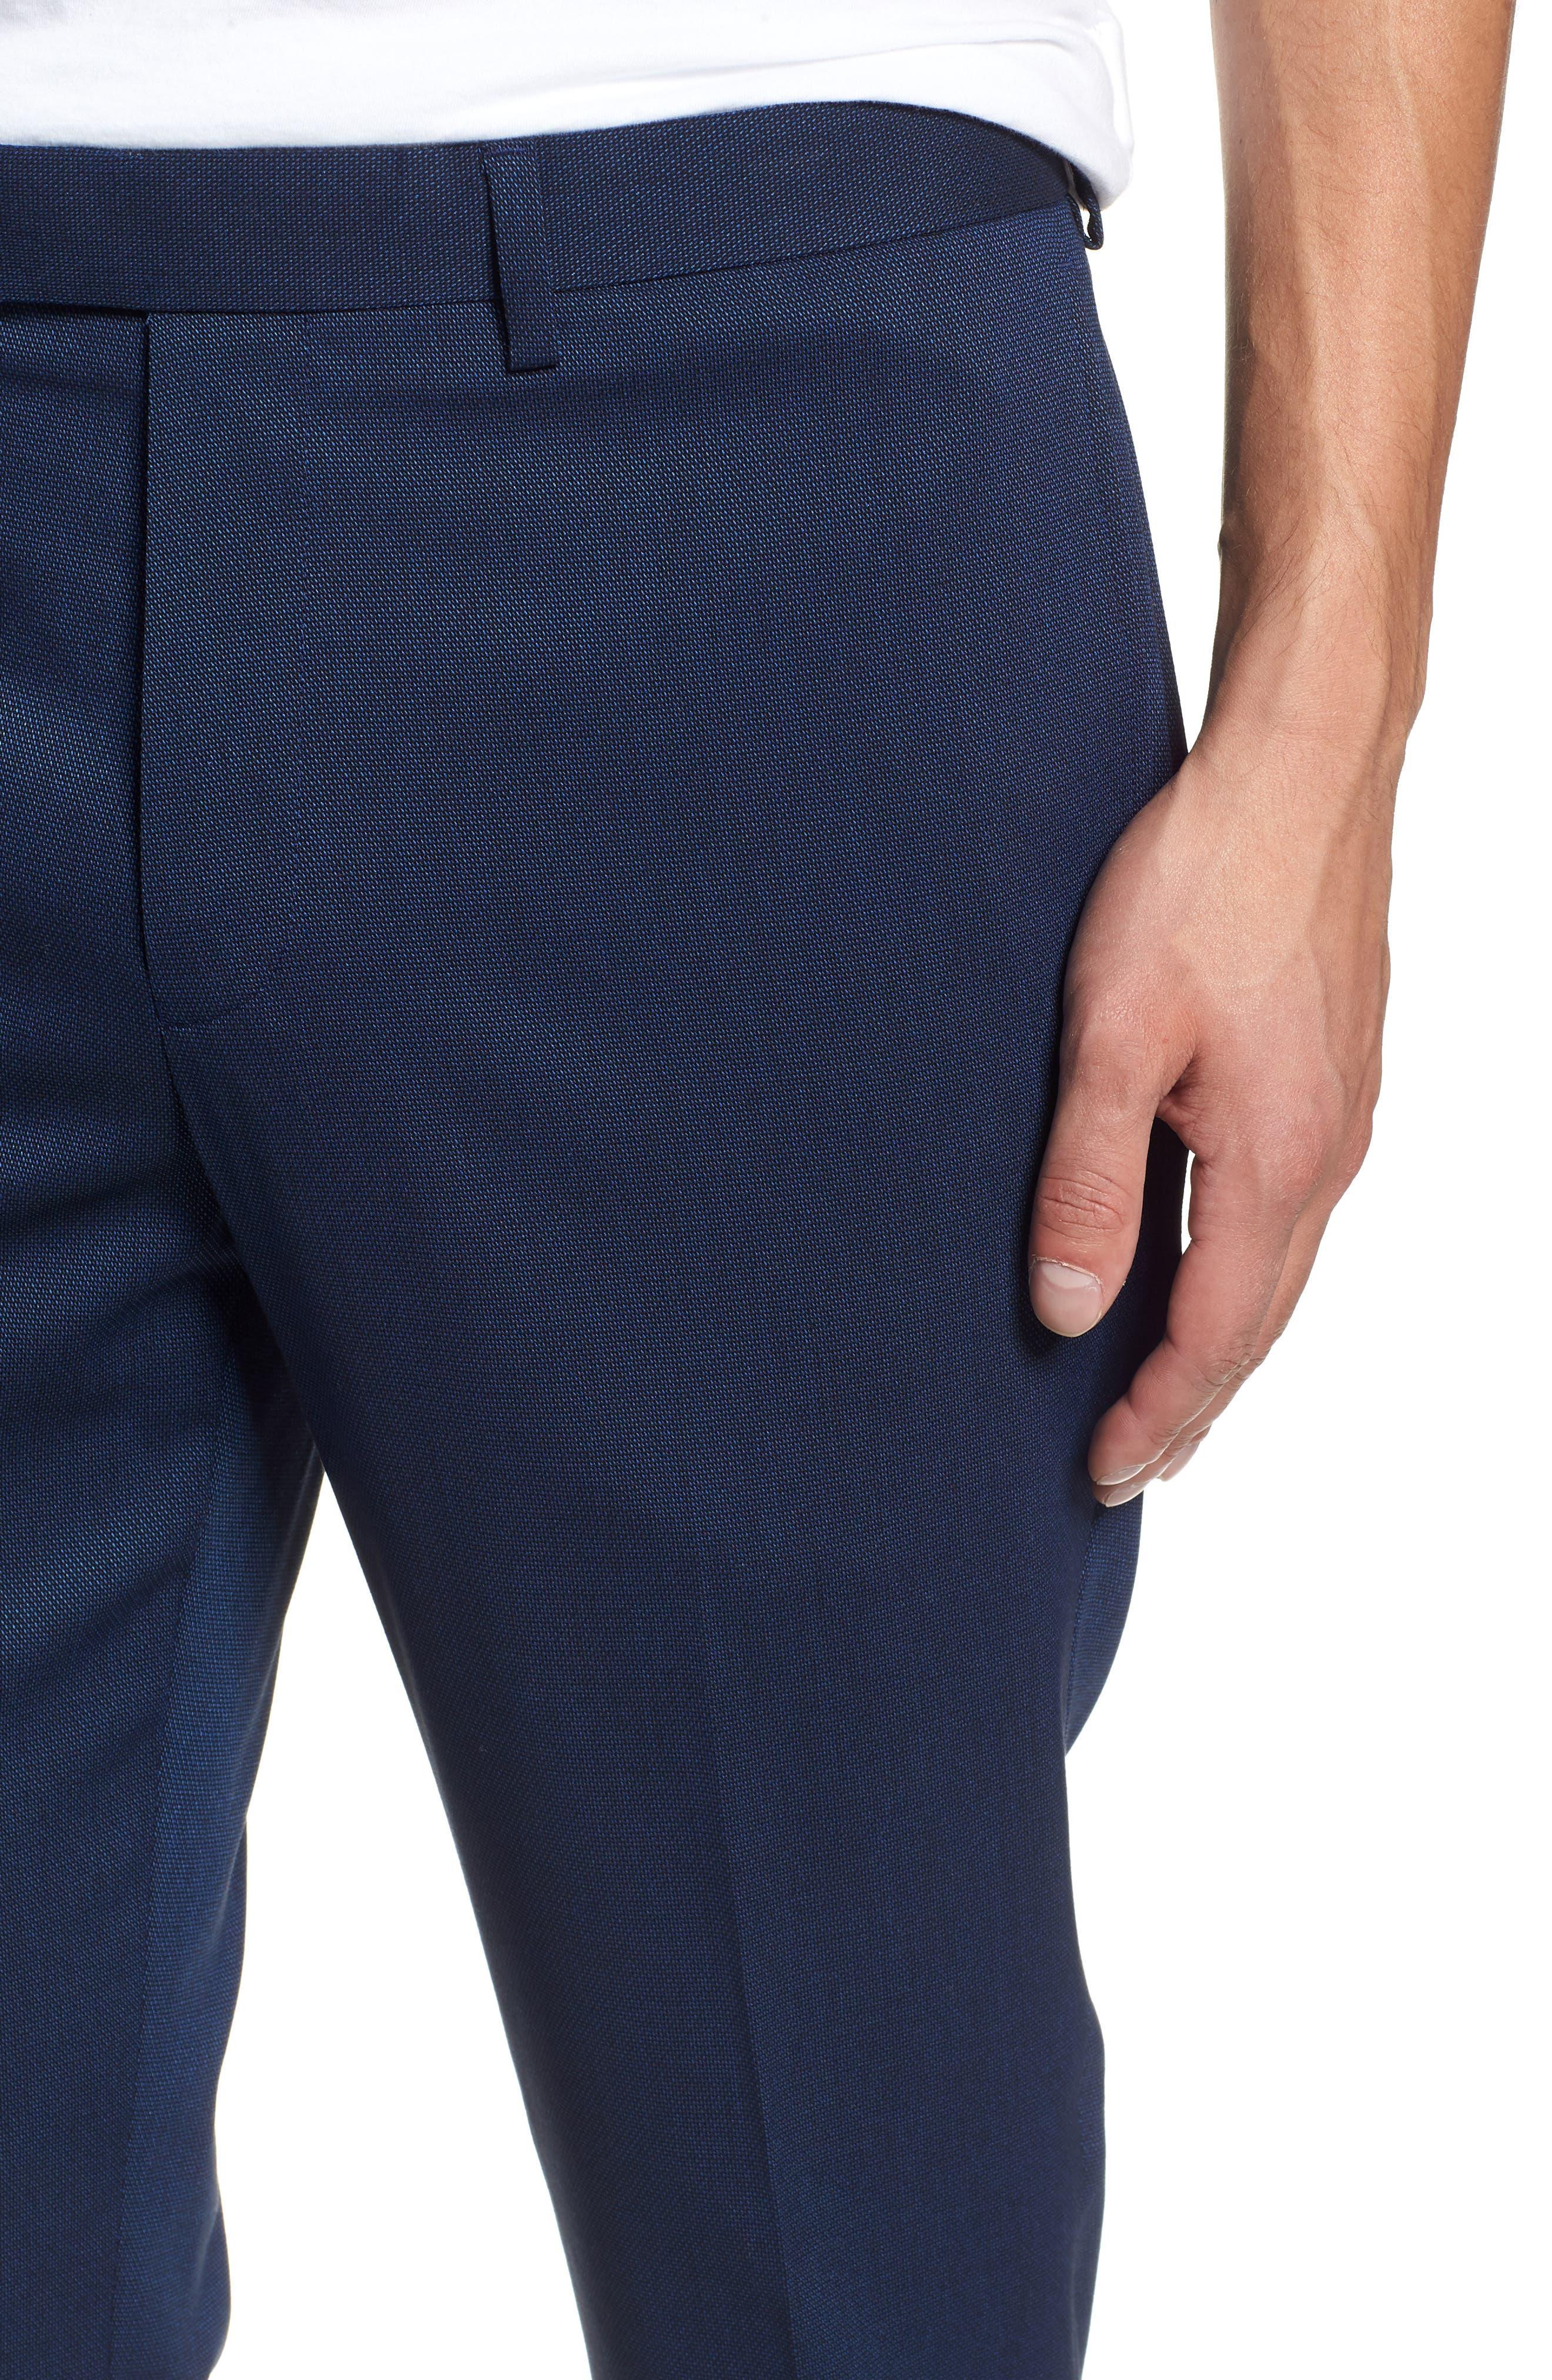 TOPMAN, Skinny Fit Suit Pants, Alternate thumbnail 4, color, MID BLUE